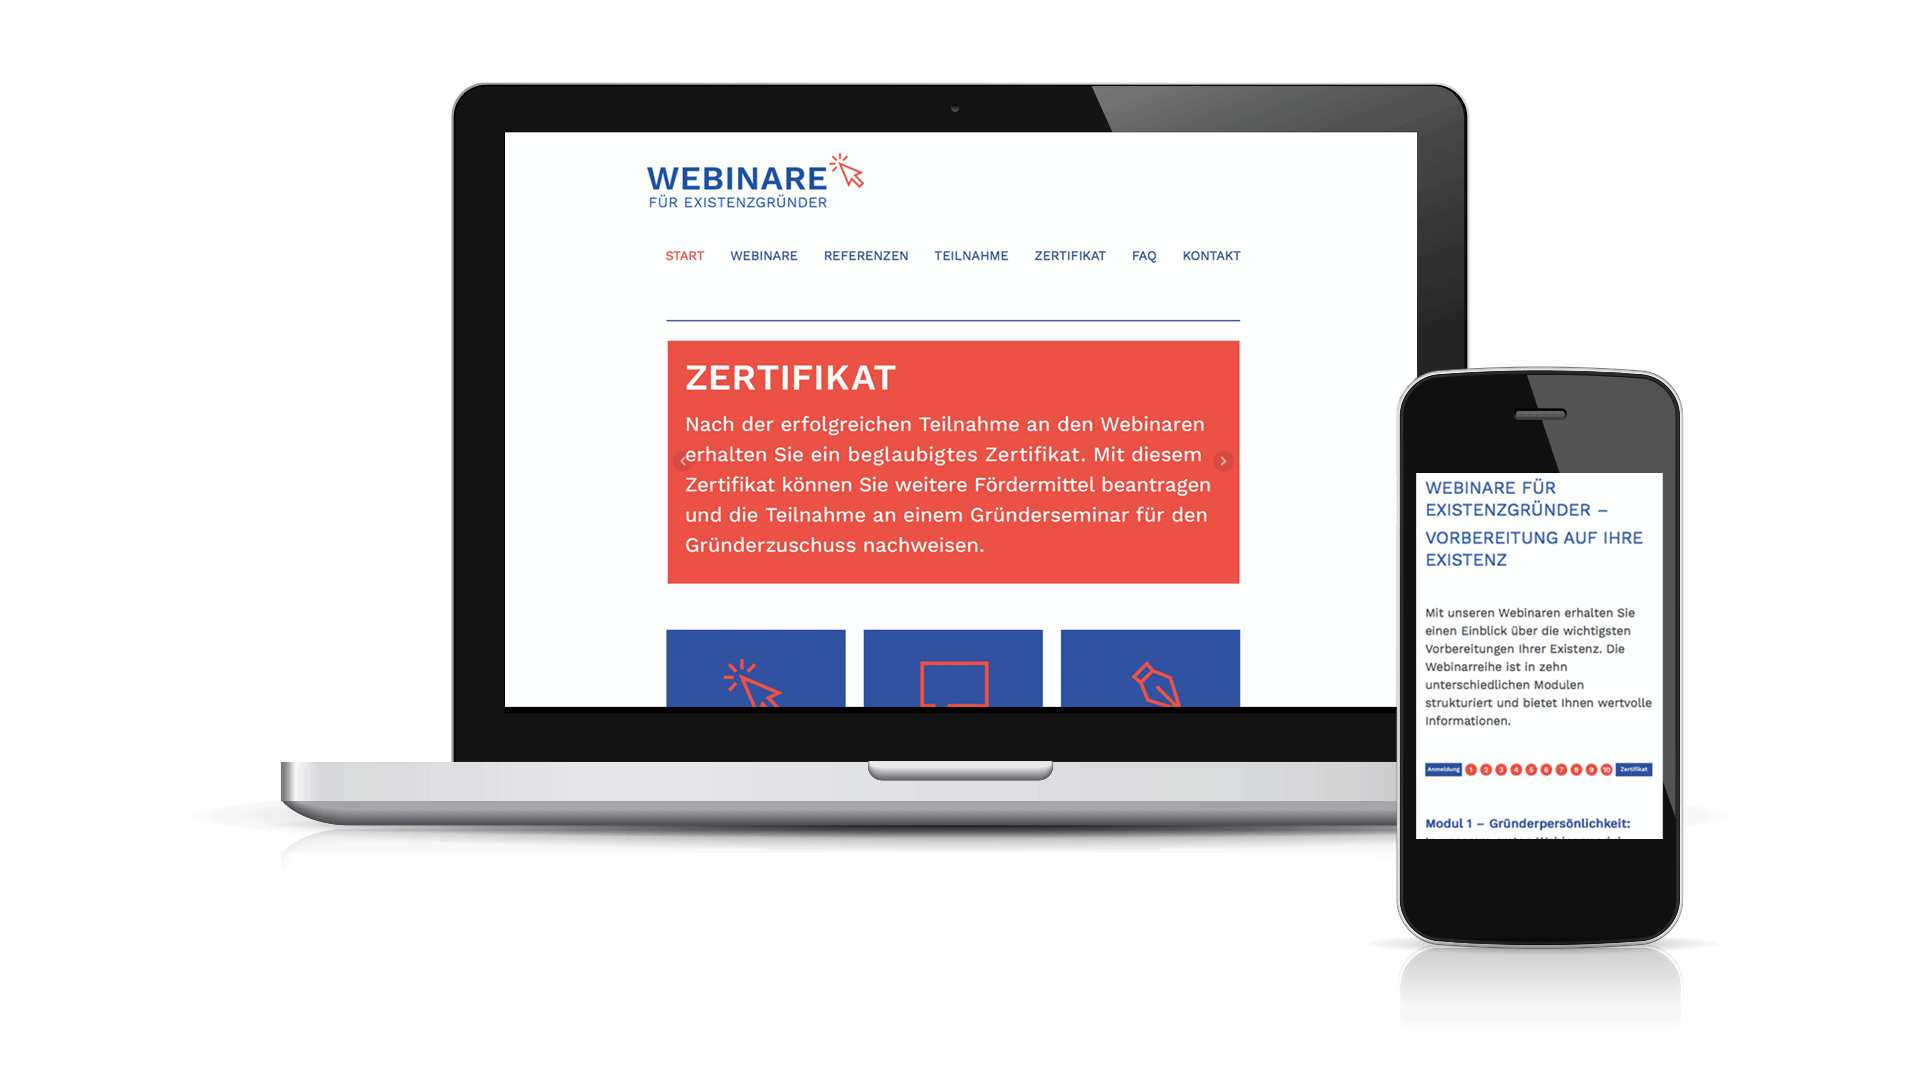 Jens Mittelsdorf Büro für Gestaltung Webinare → Corporate Design, Piktogramme, Webdesign